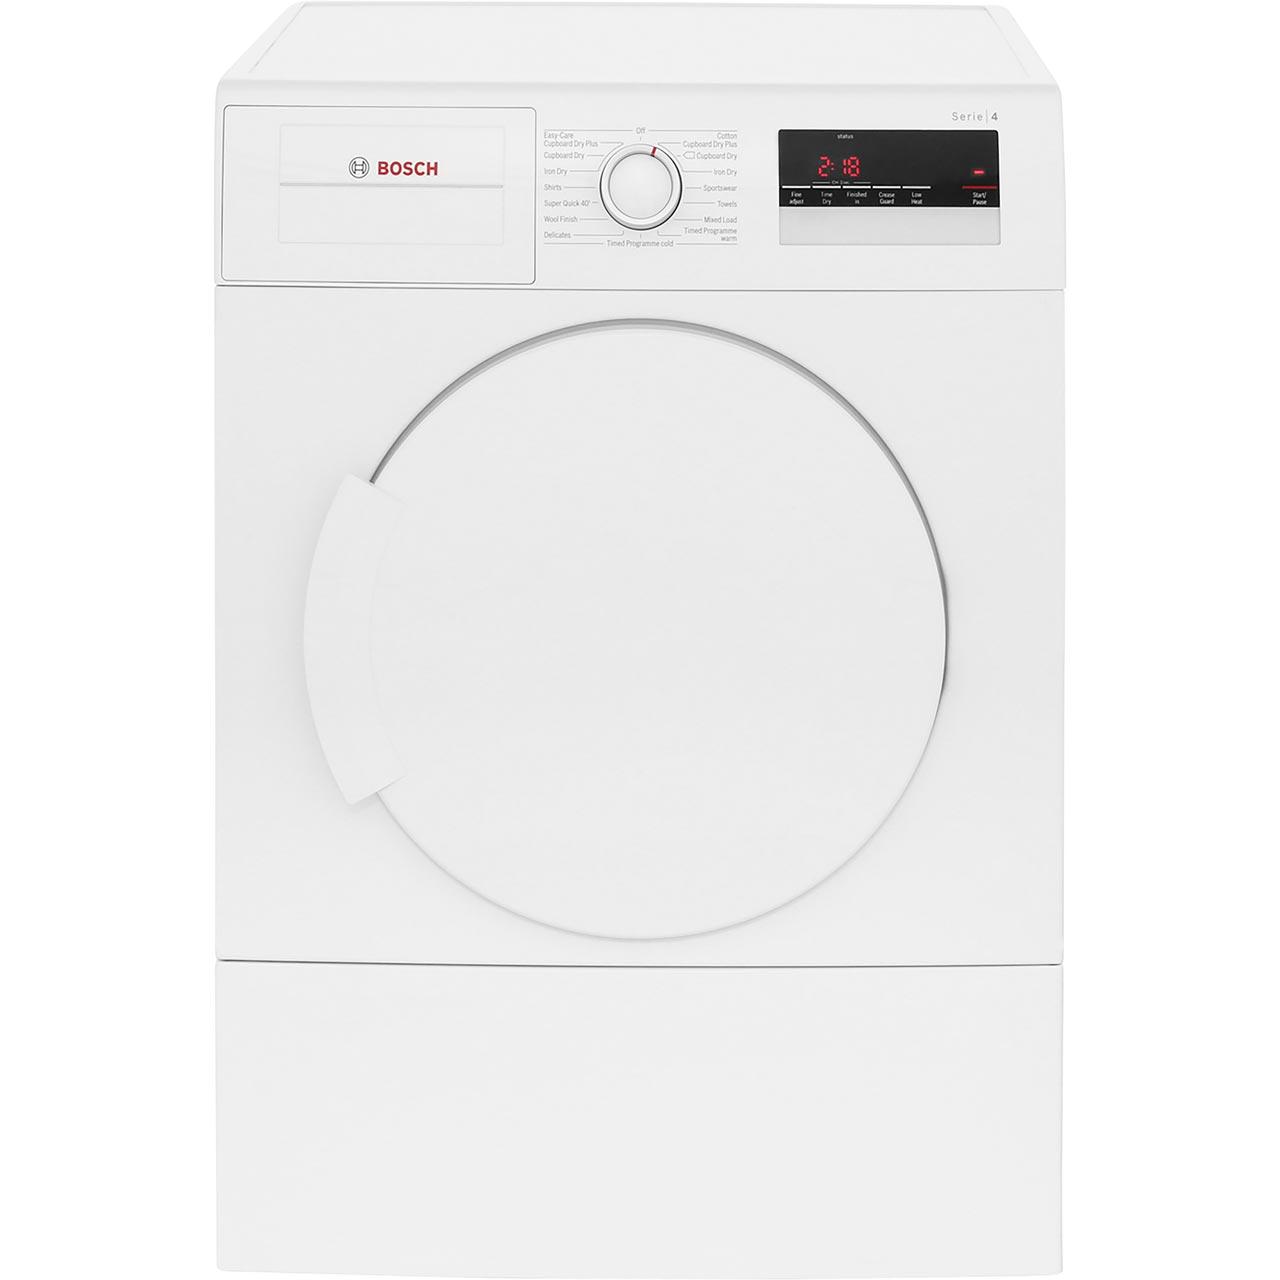 Bosch Serie 4 WTA79200GB 7Kg Vented Tumble Dryer